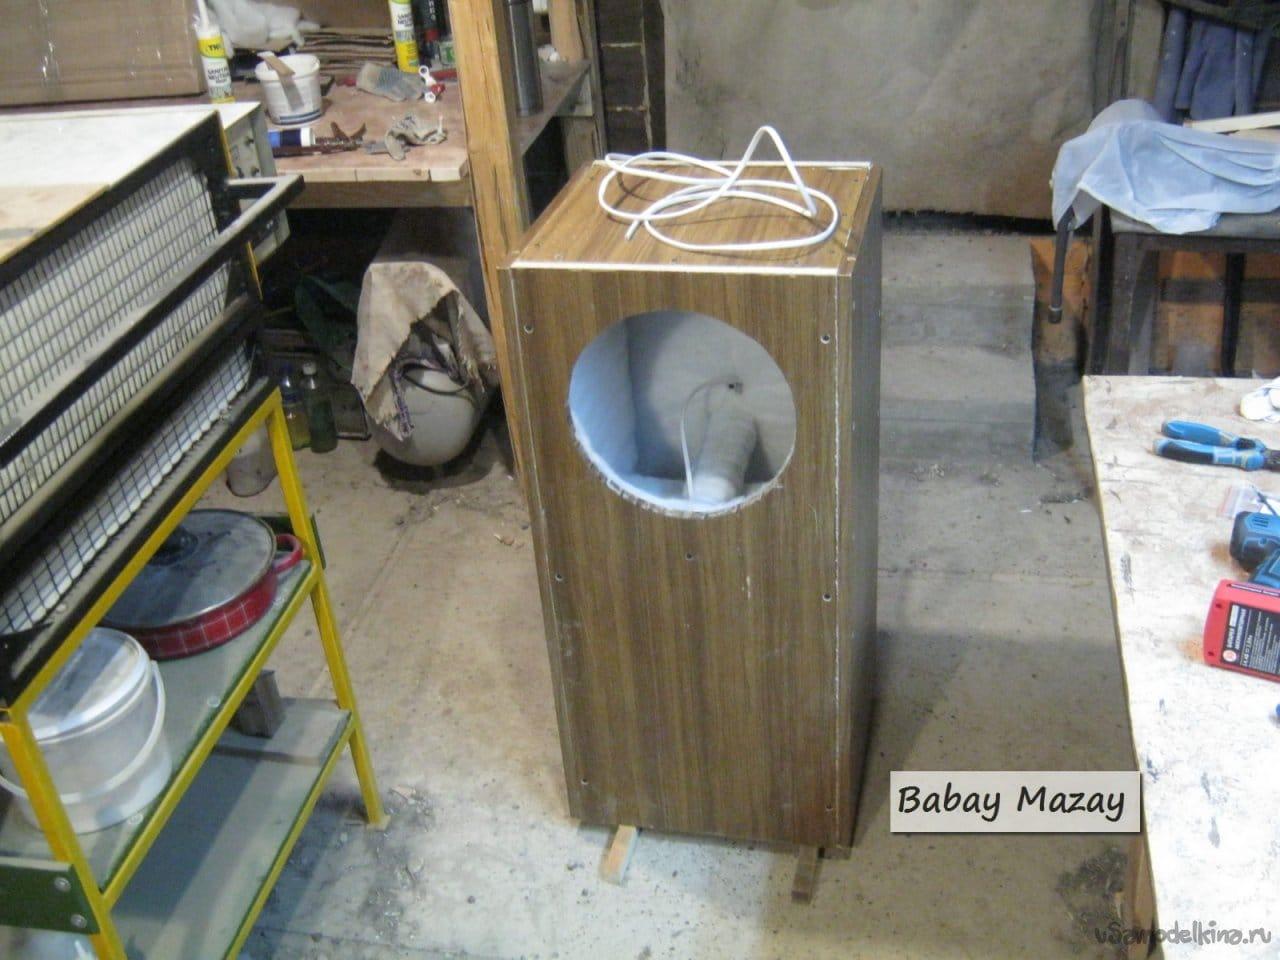 High-quality utilitarian speaker made of trash